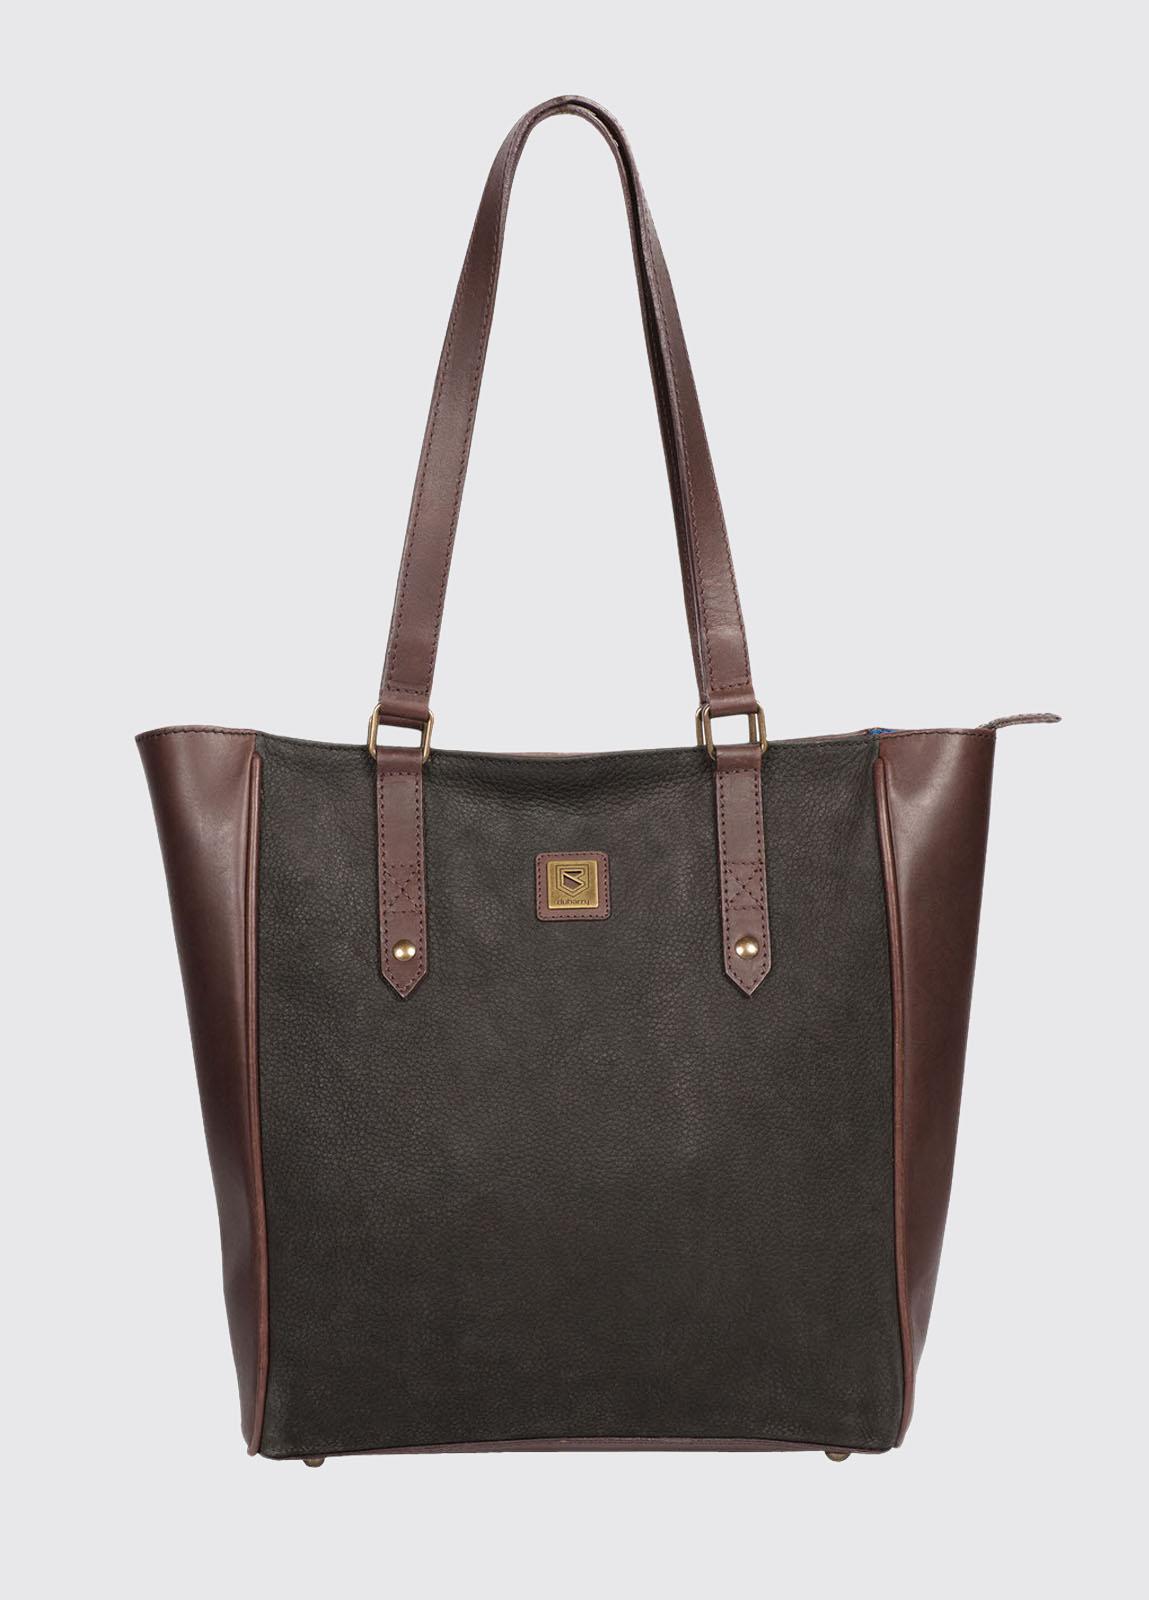 Bandon Tote Bag - Black/Brown